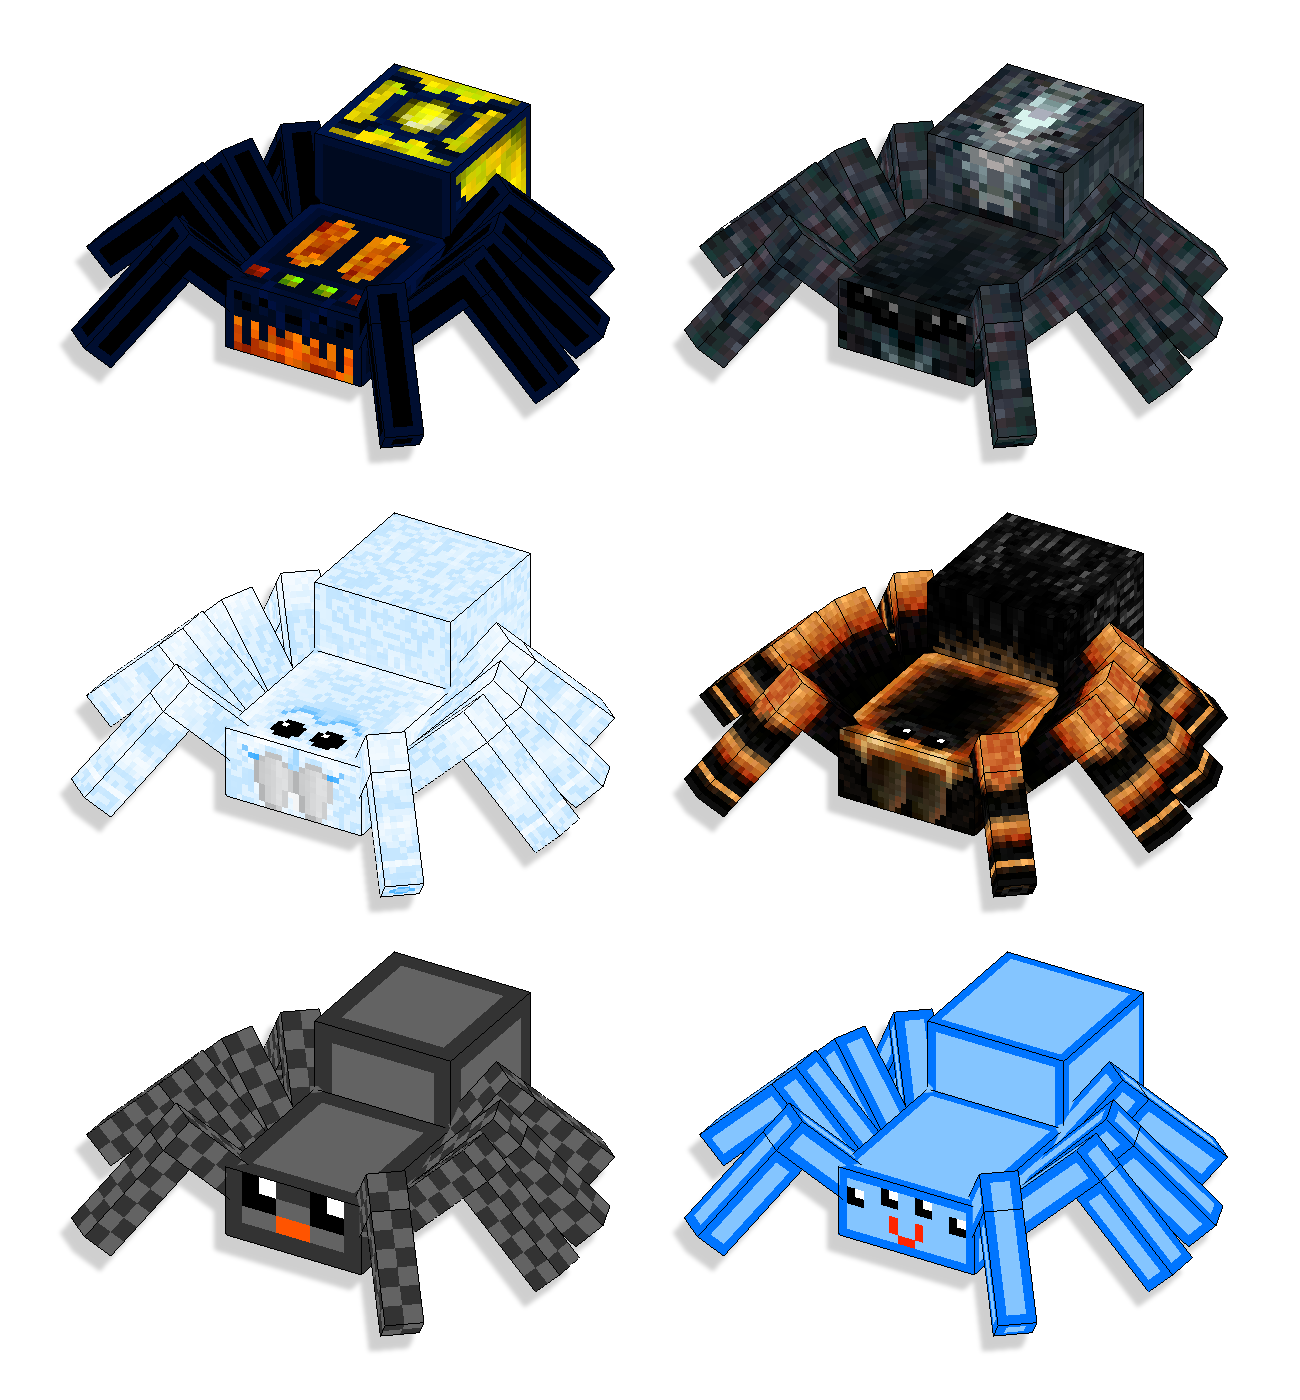 Image Spider mob